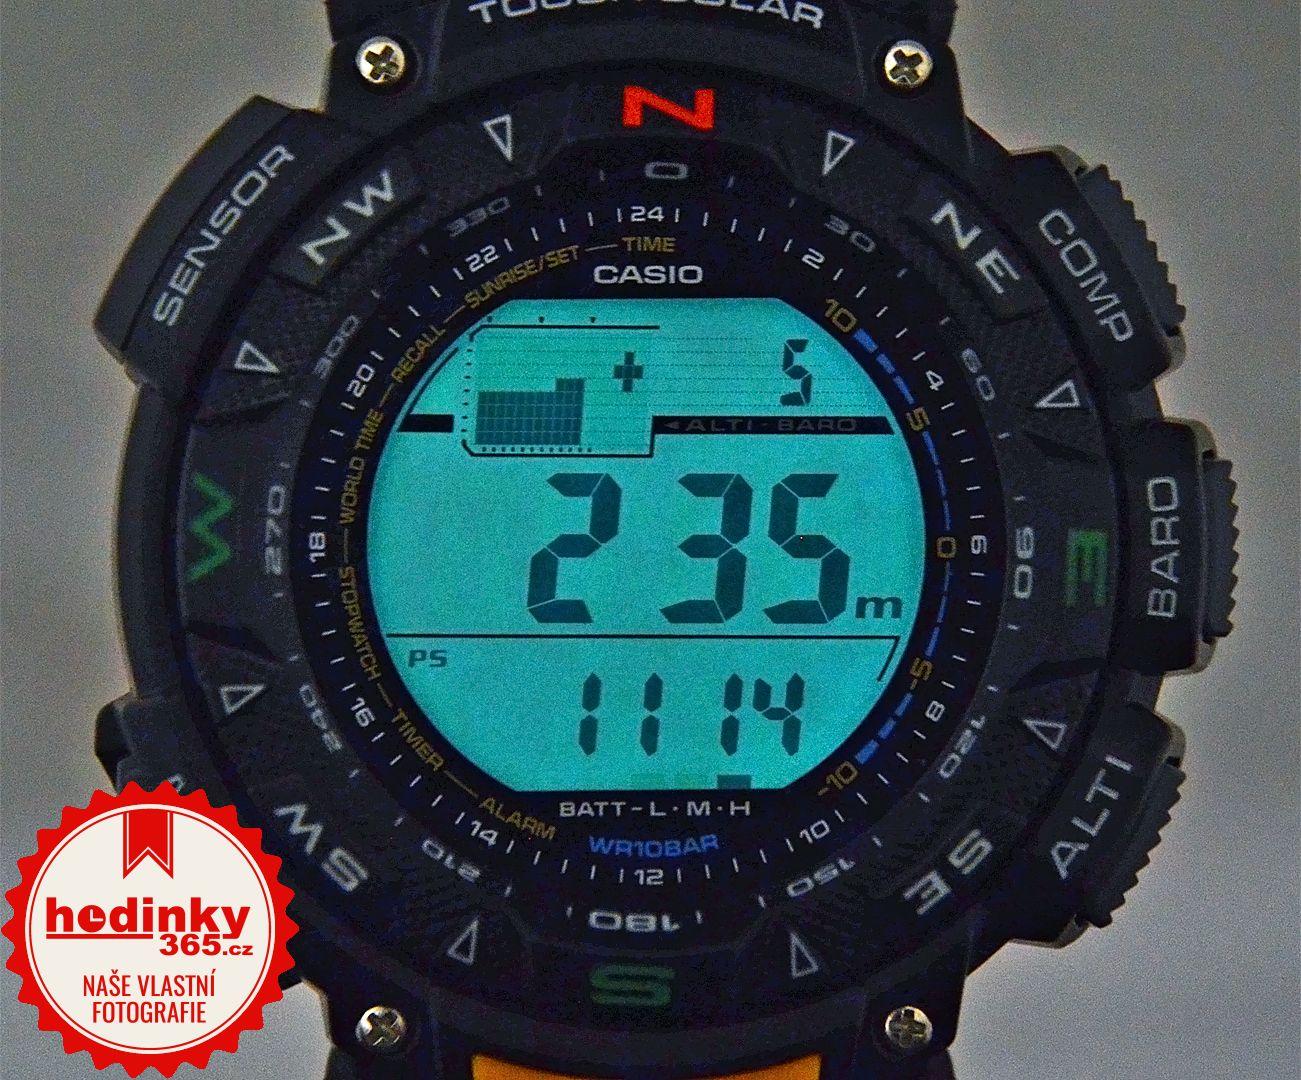 Casio Protrek PRG-240-1ER. Hodnocení  4 eff13e80846